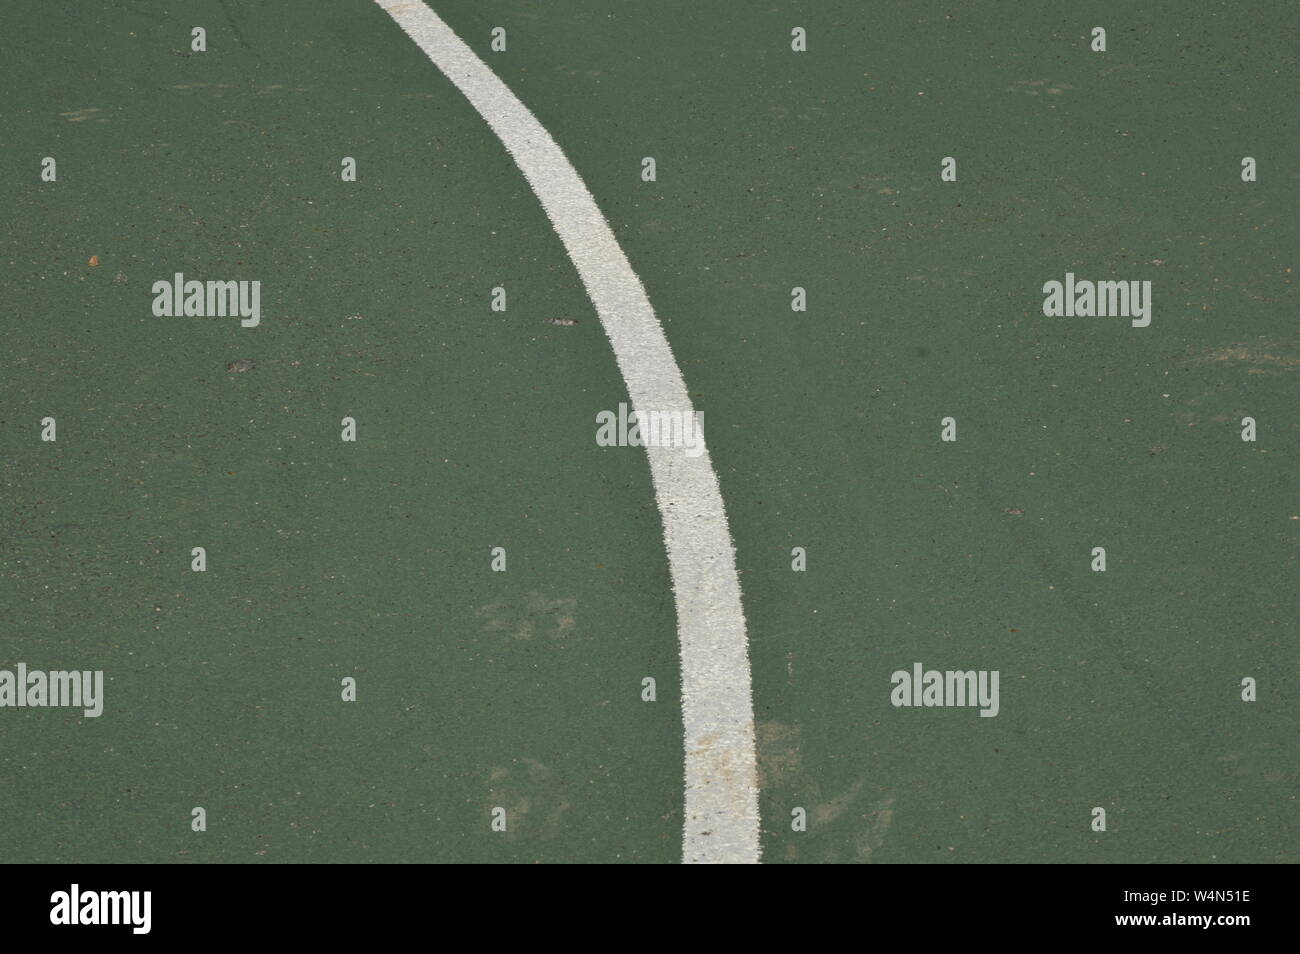 Closeup on a jogging runway Stock Photo